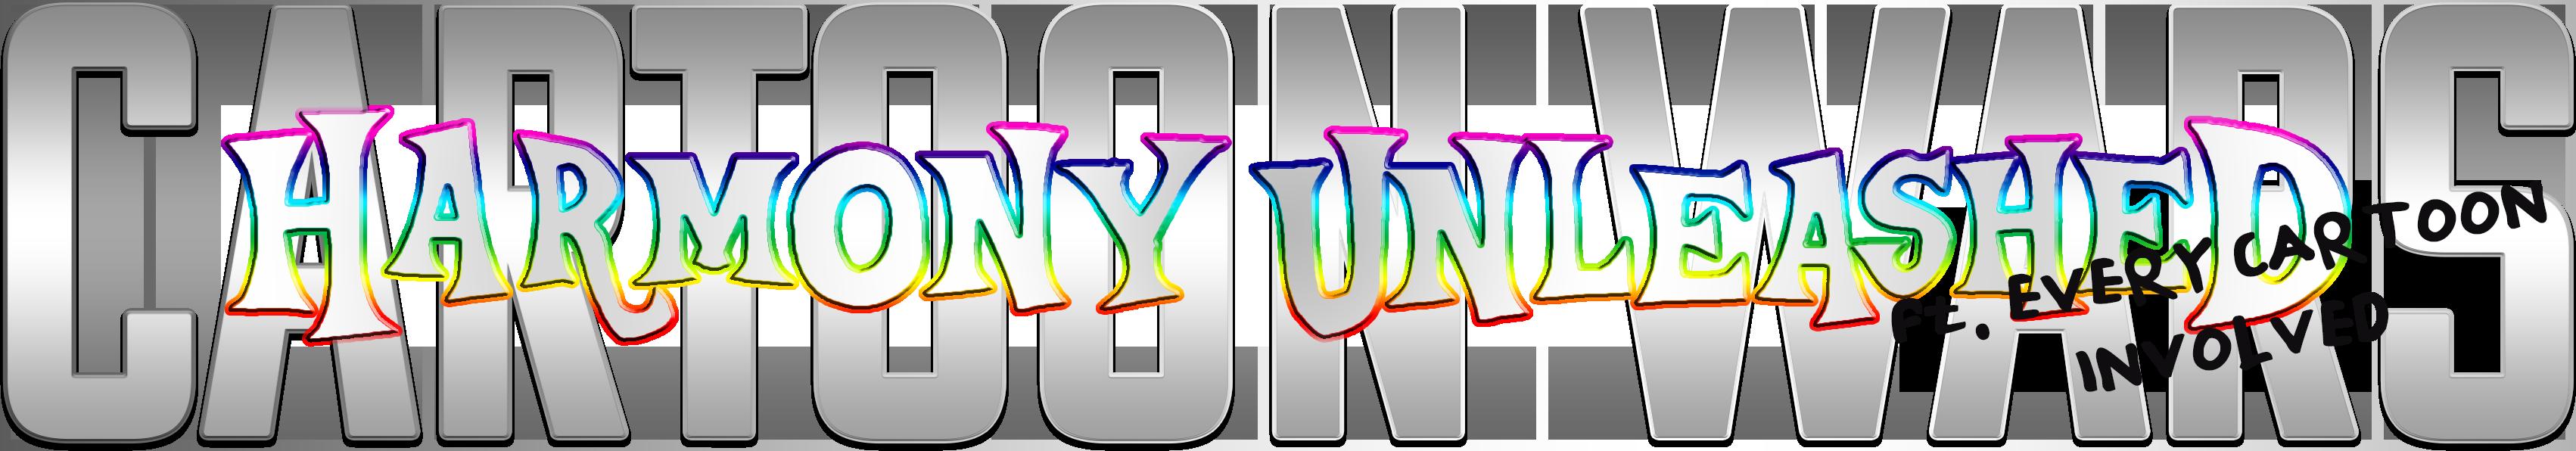 HU Cartoon Wars Logo.png